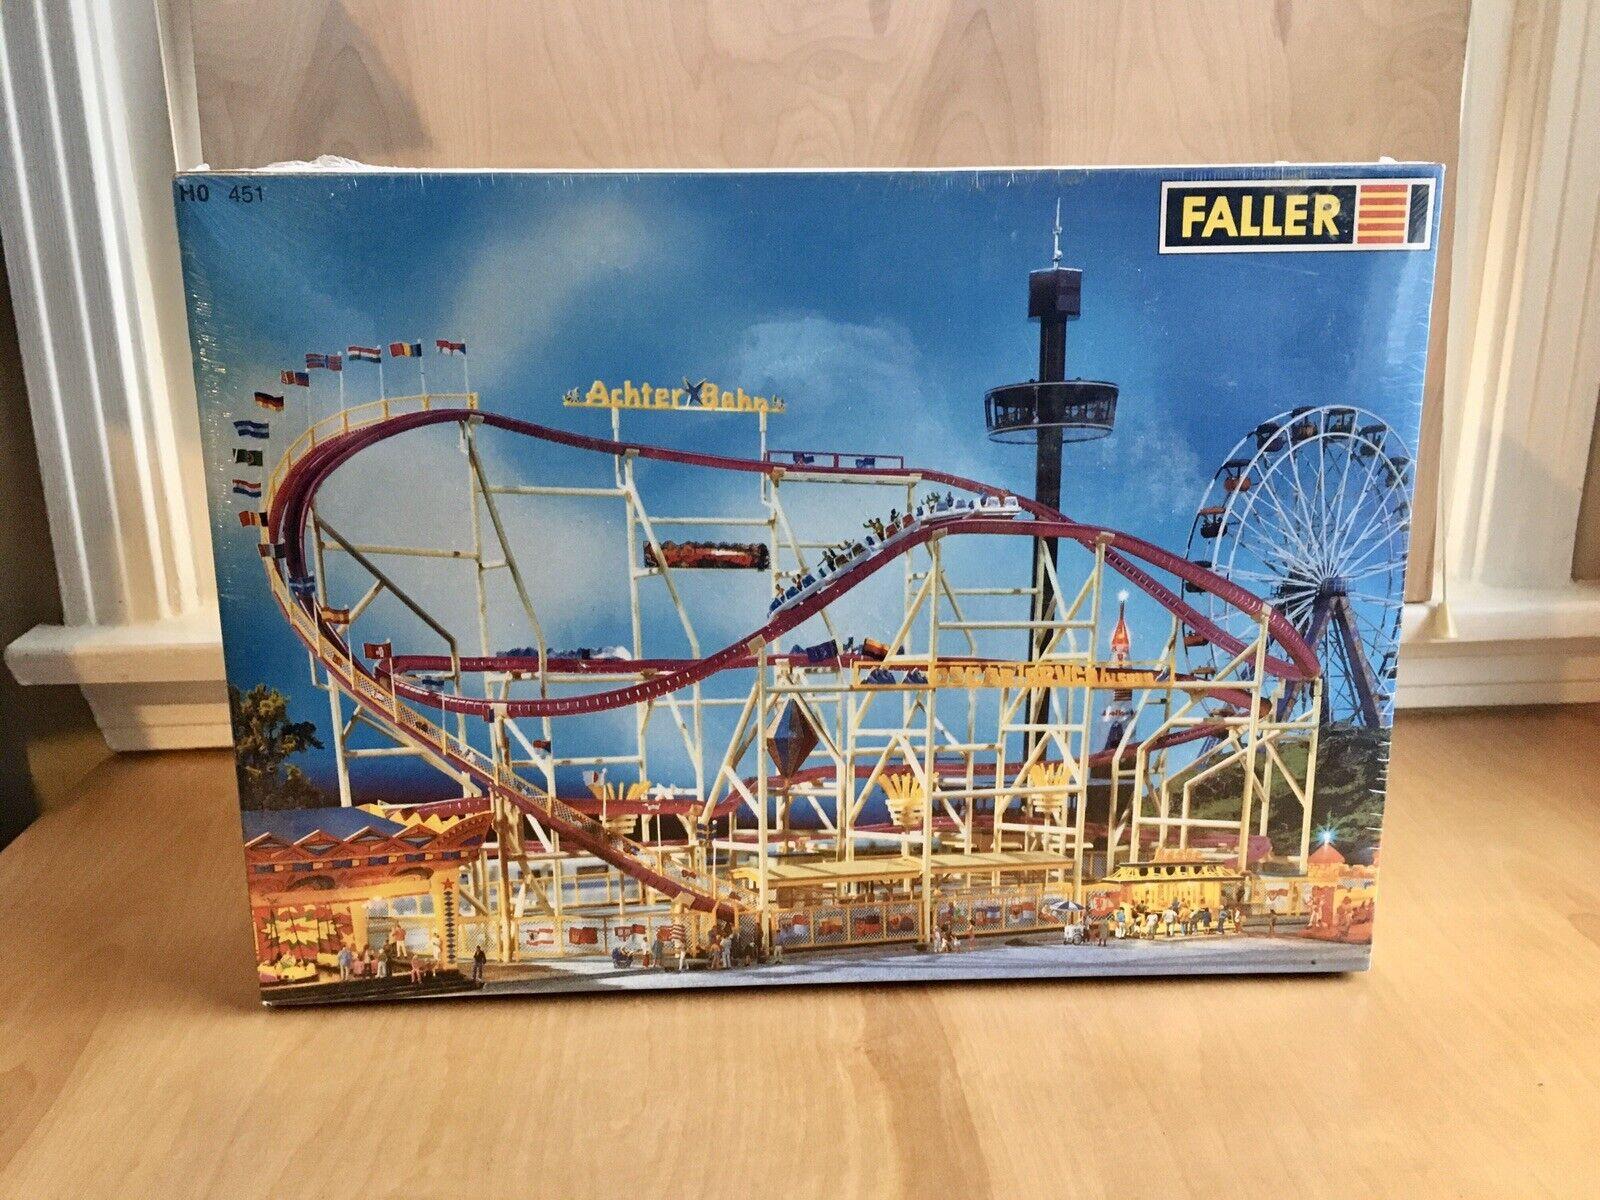 Ftuttier Achter Bahn Roller Coaster HOScale  140 451 CircusFair nuovoSealed